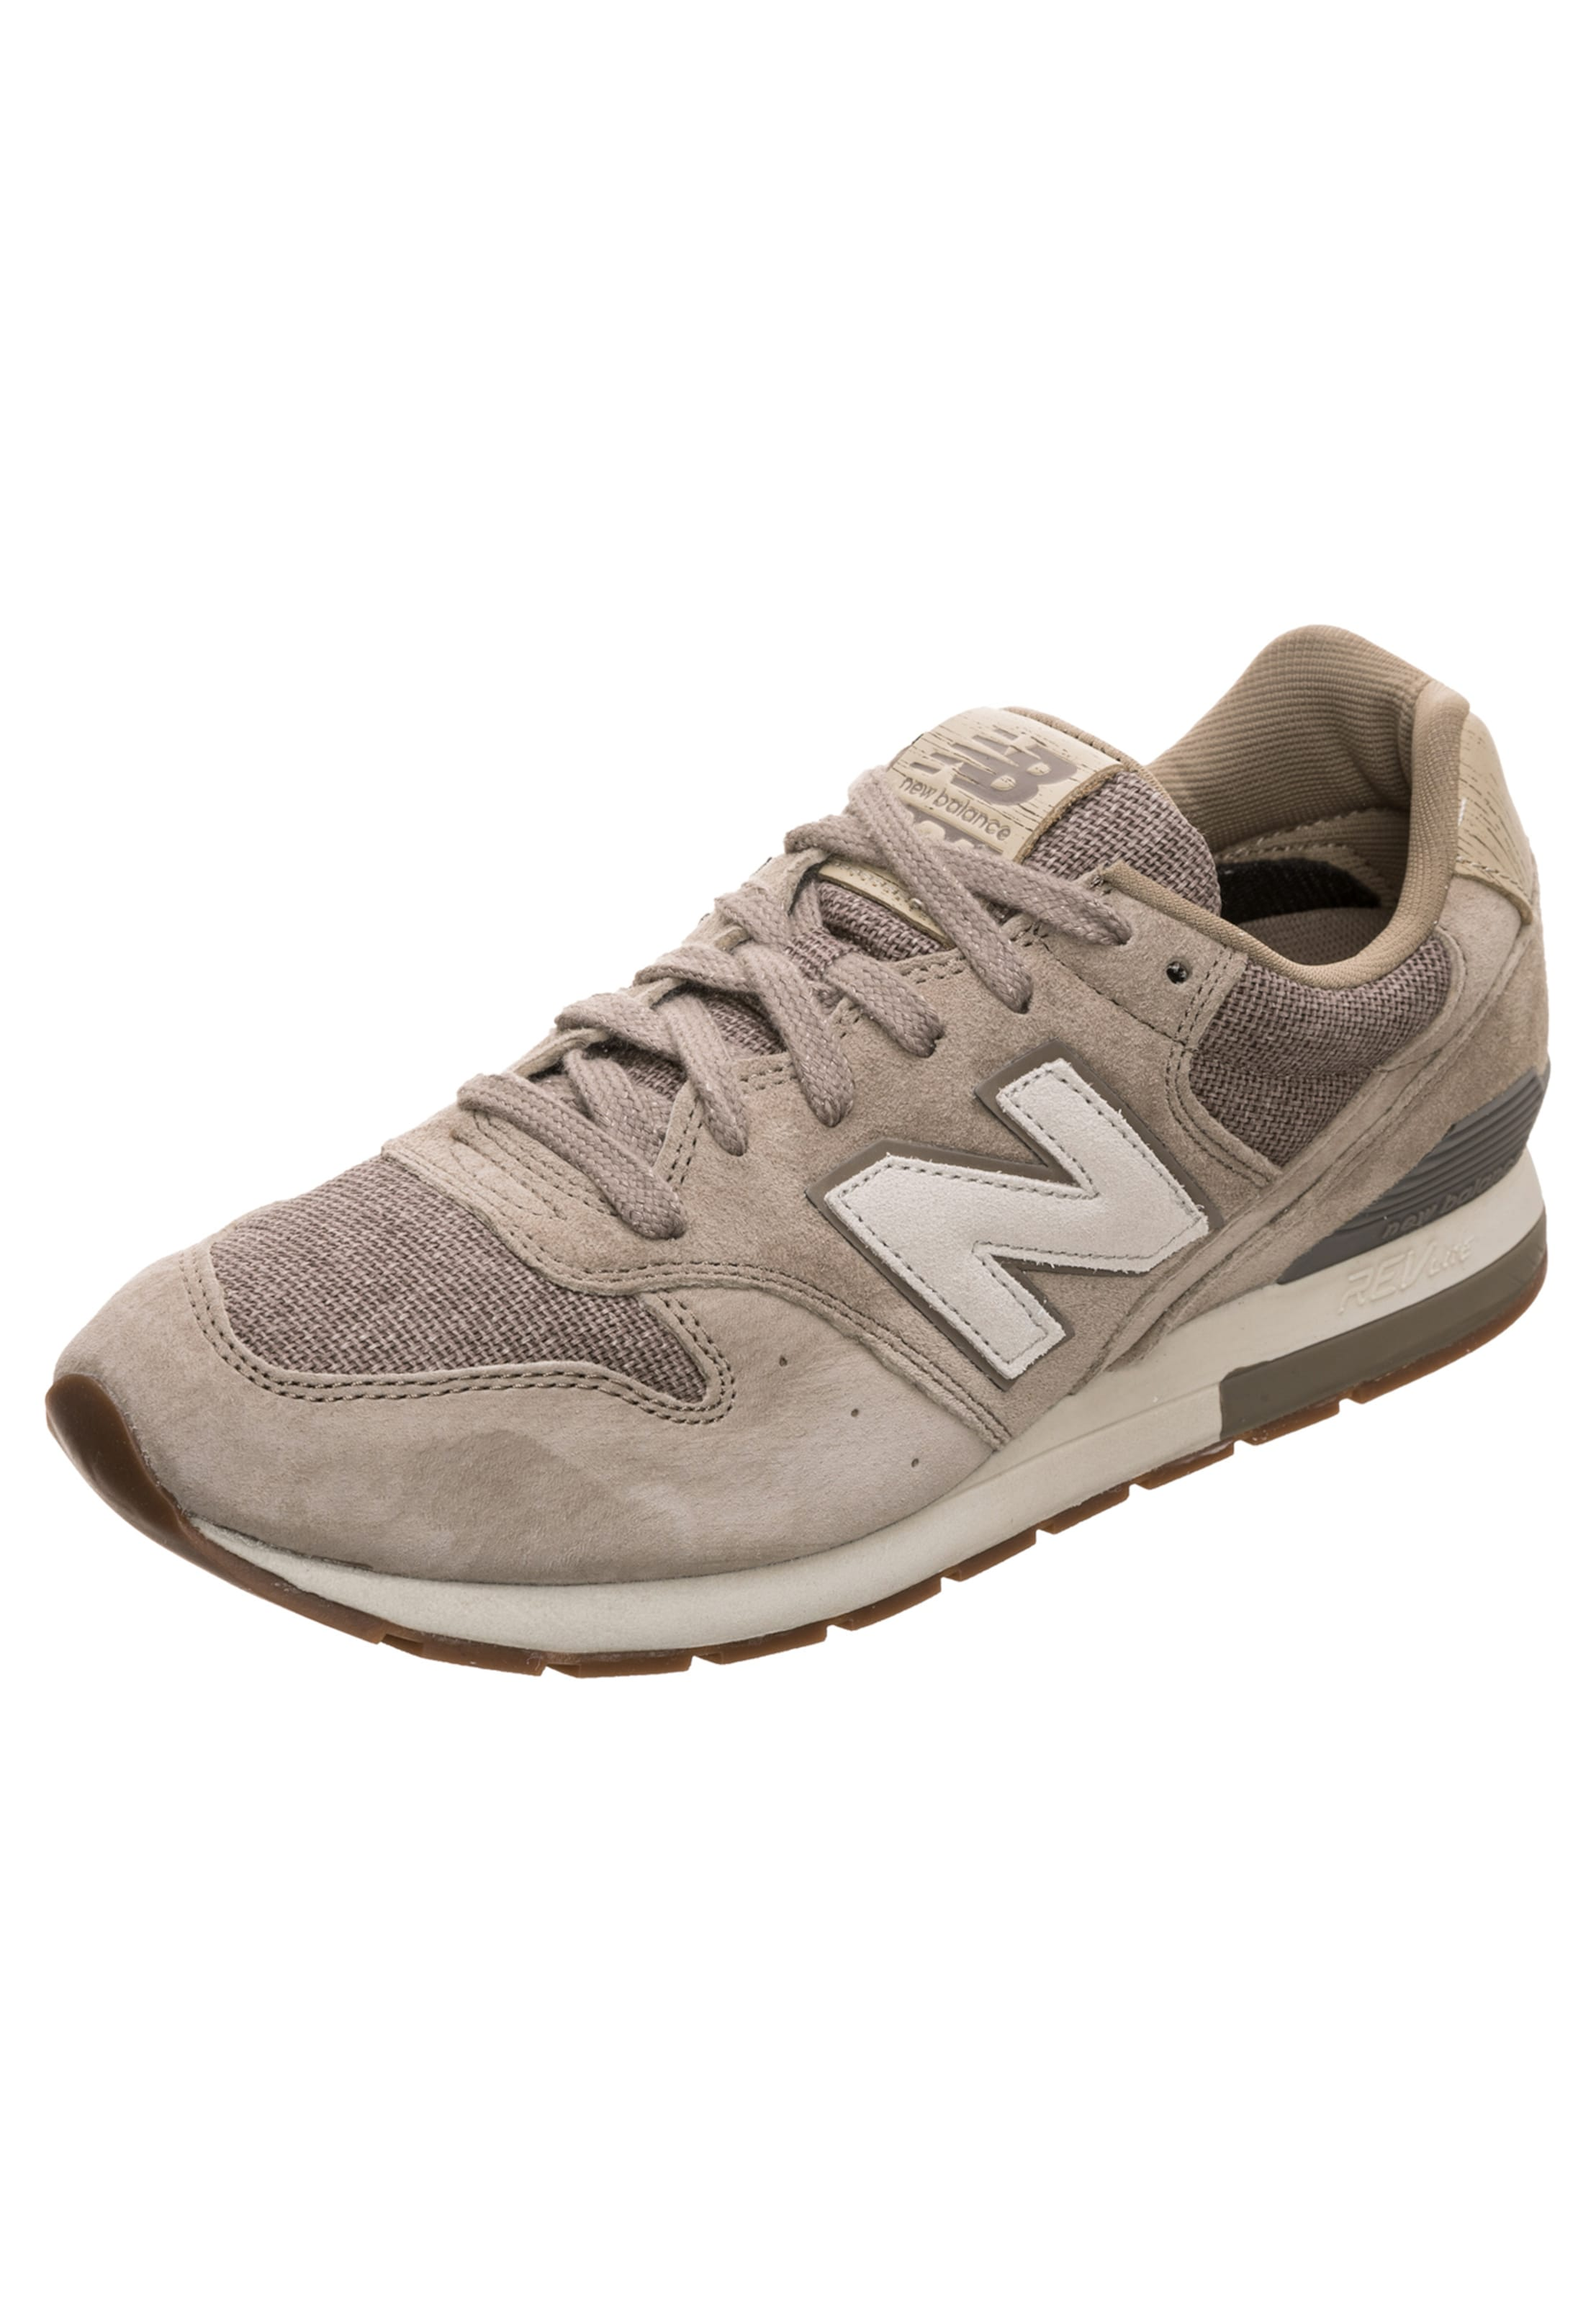 new balance MRL996-PC-D Sneaker Günstige und langlebige Schuhe